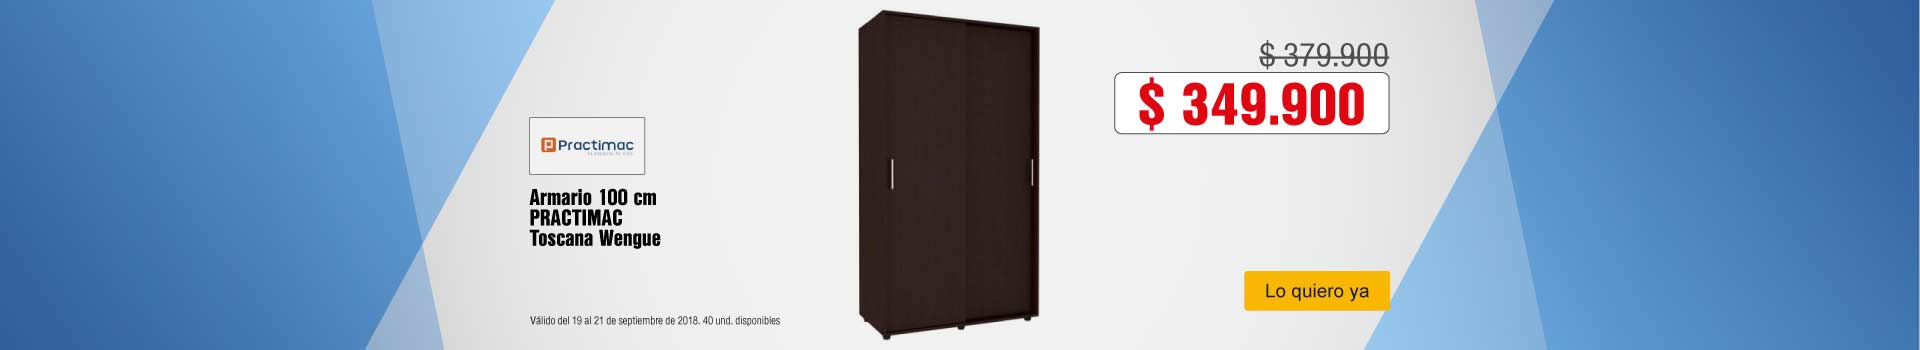 AK-BCAT-3-muebles-PP---practimac-armario-toscana-19sep